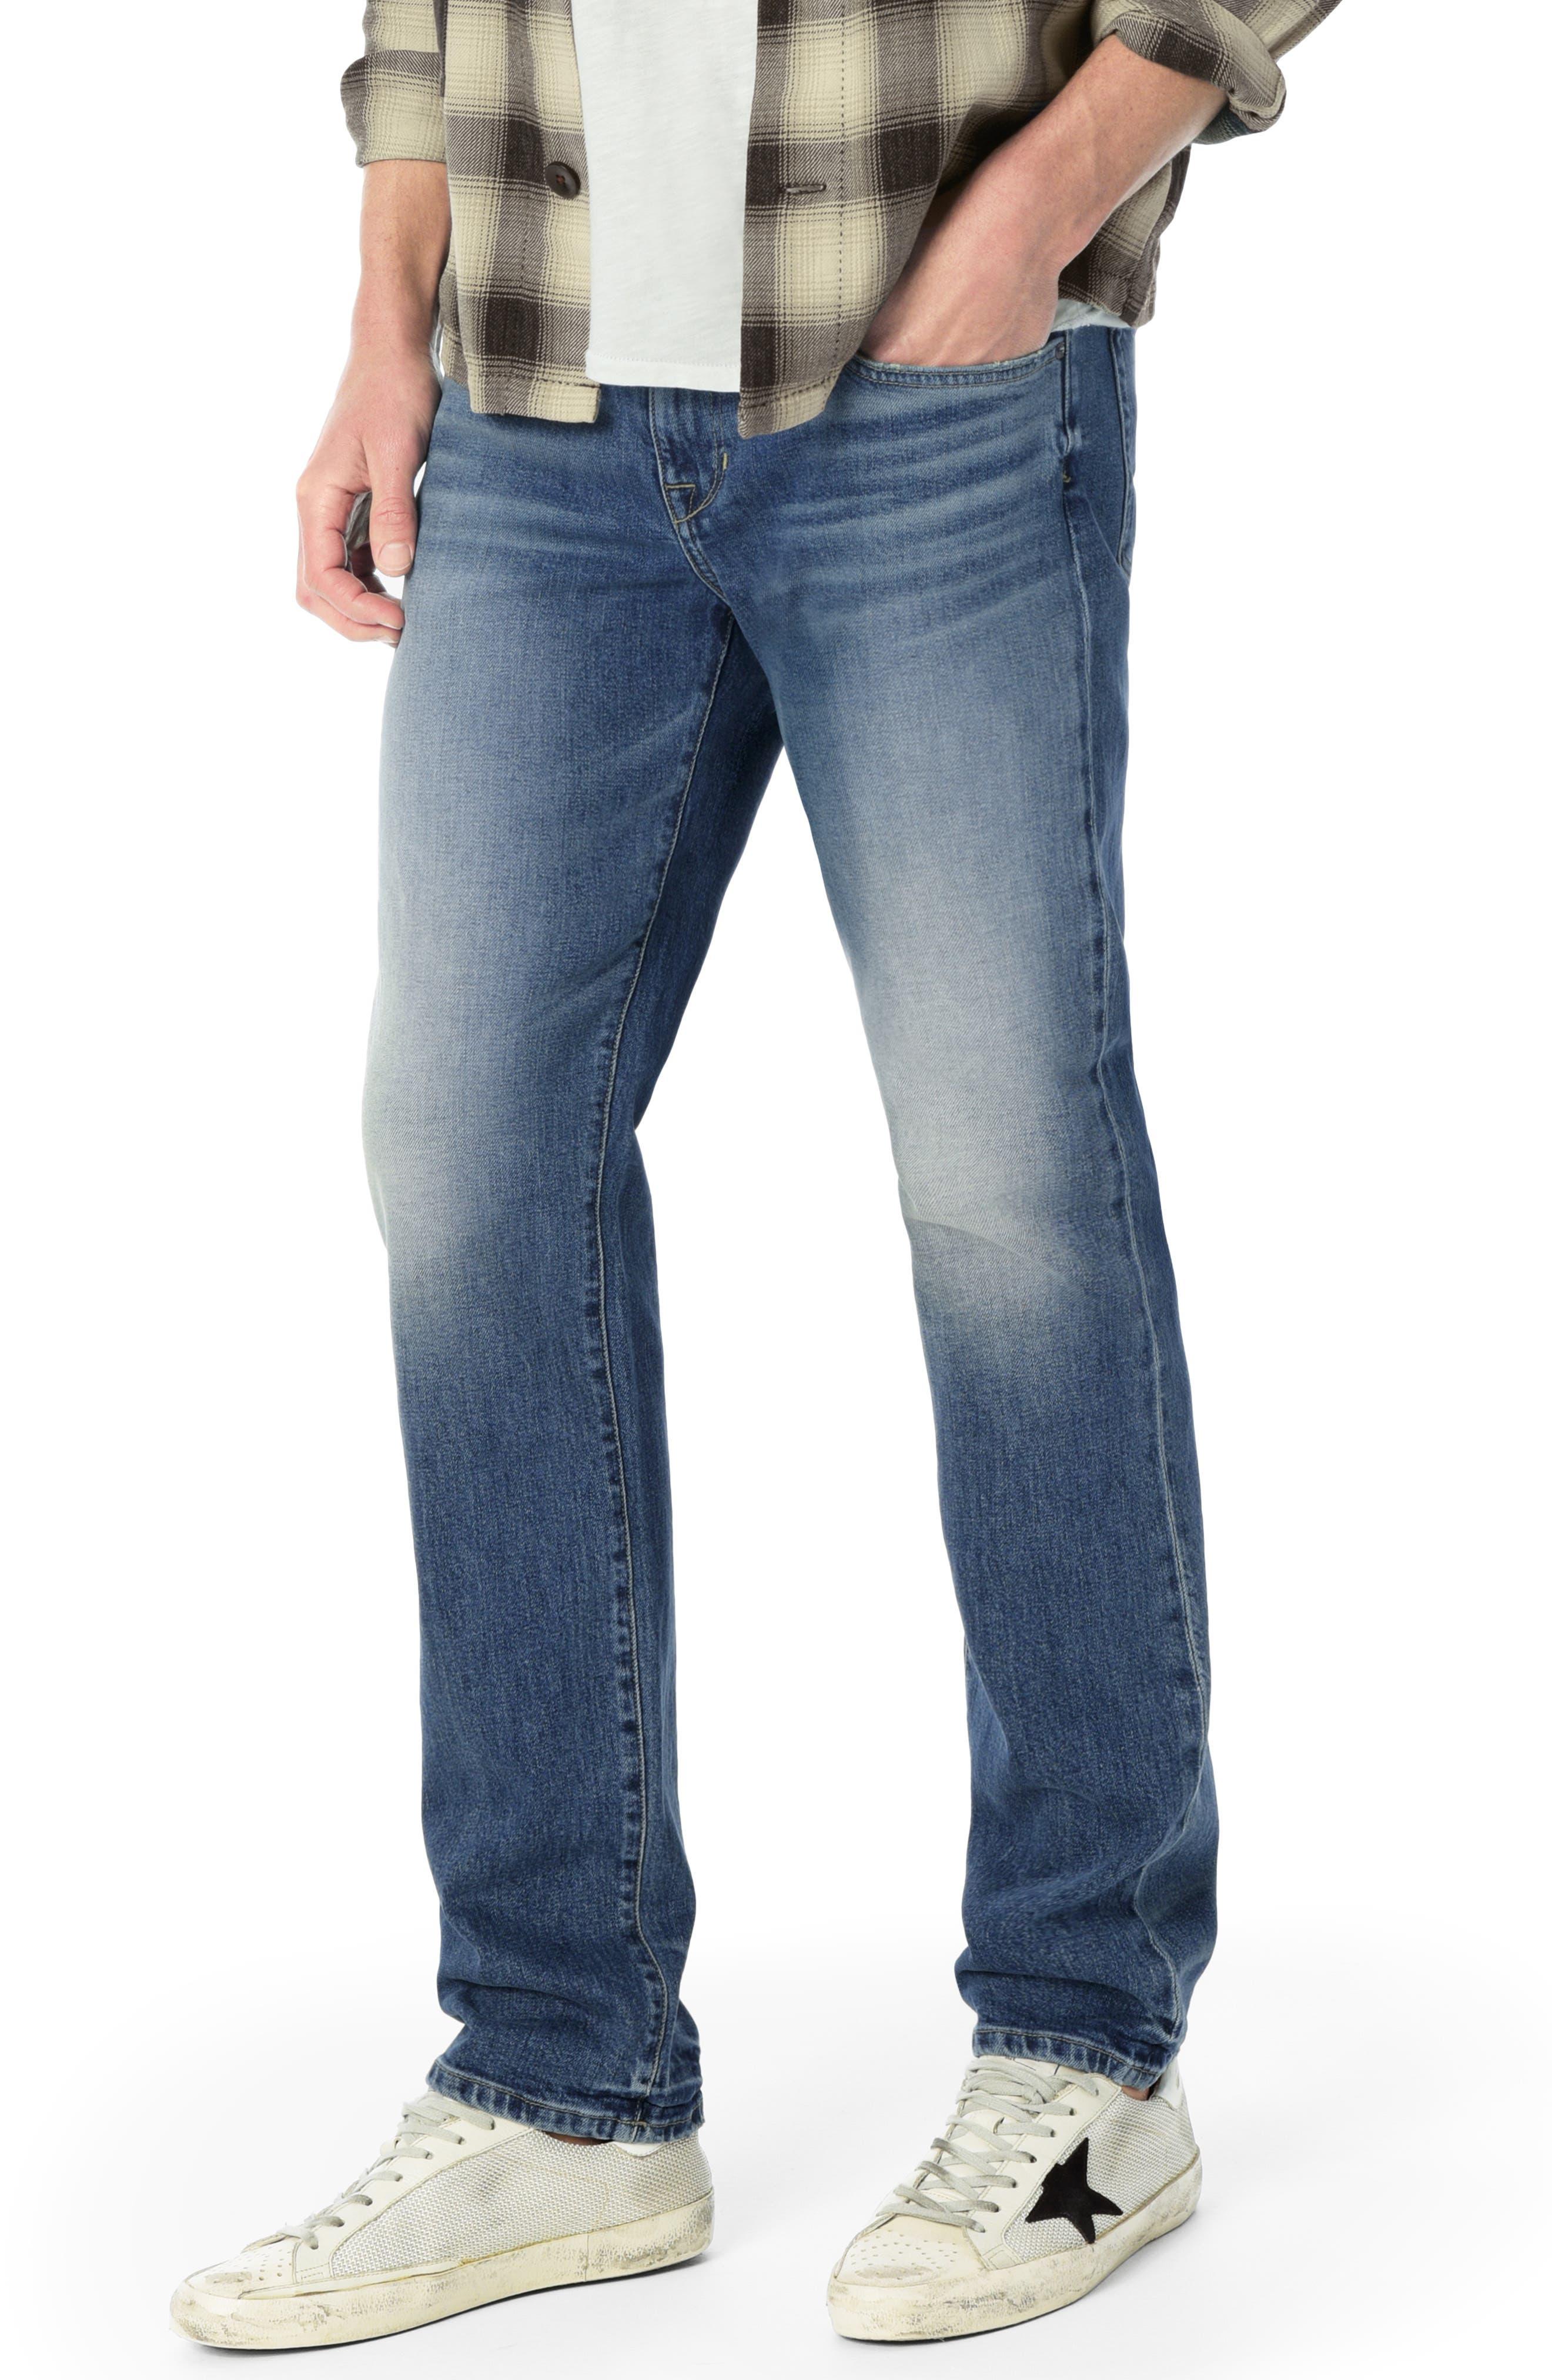 Brixton Slim Straight Leg Jeans,                         Main,                         color, HARPO